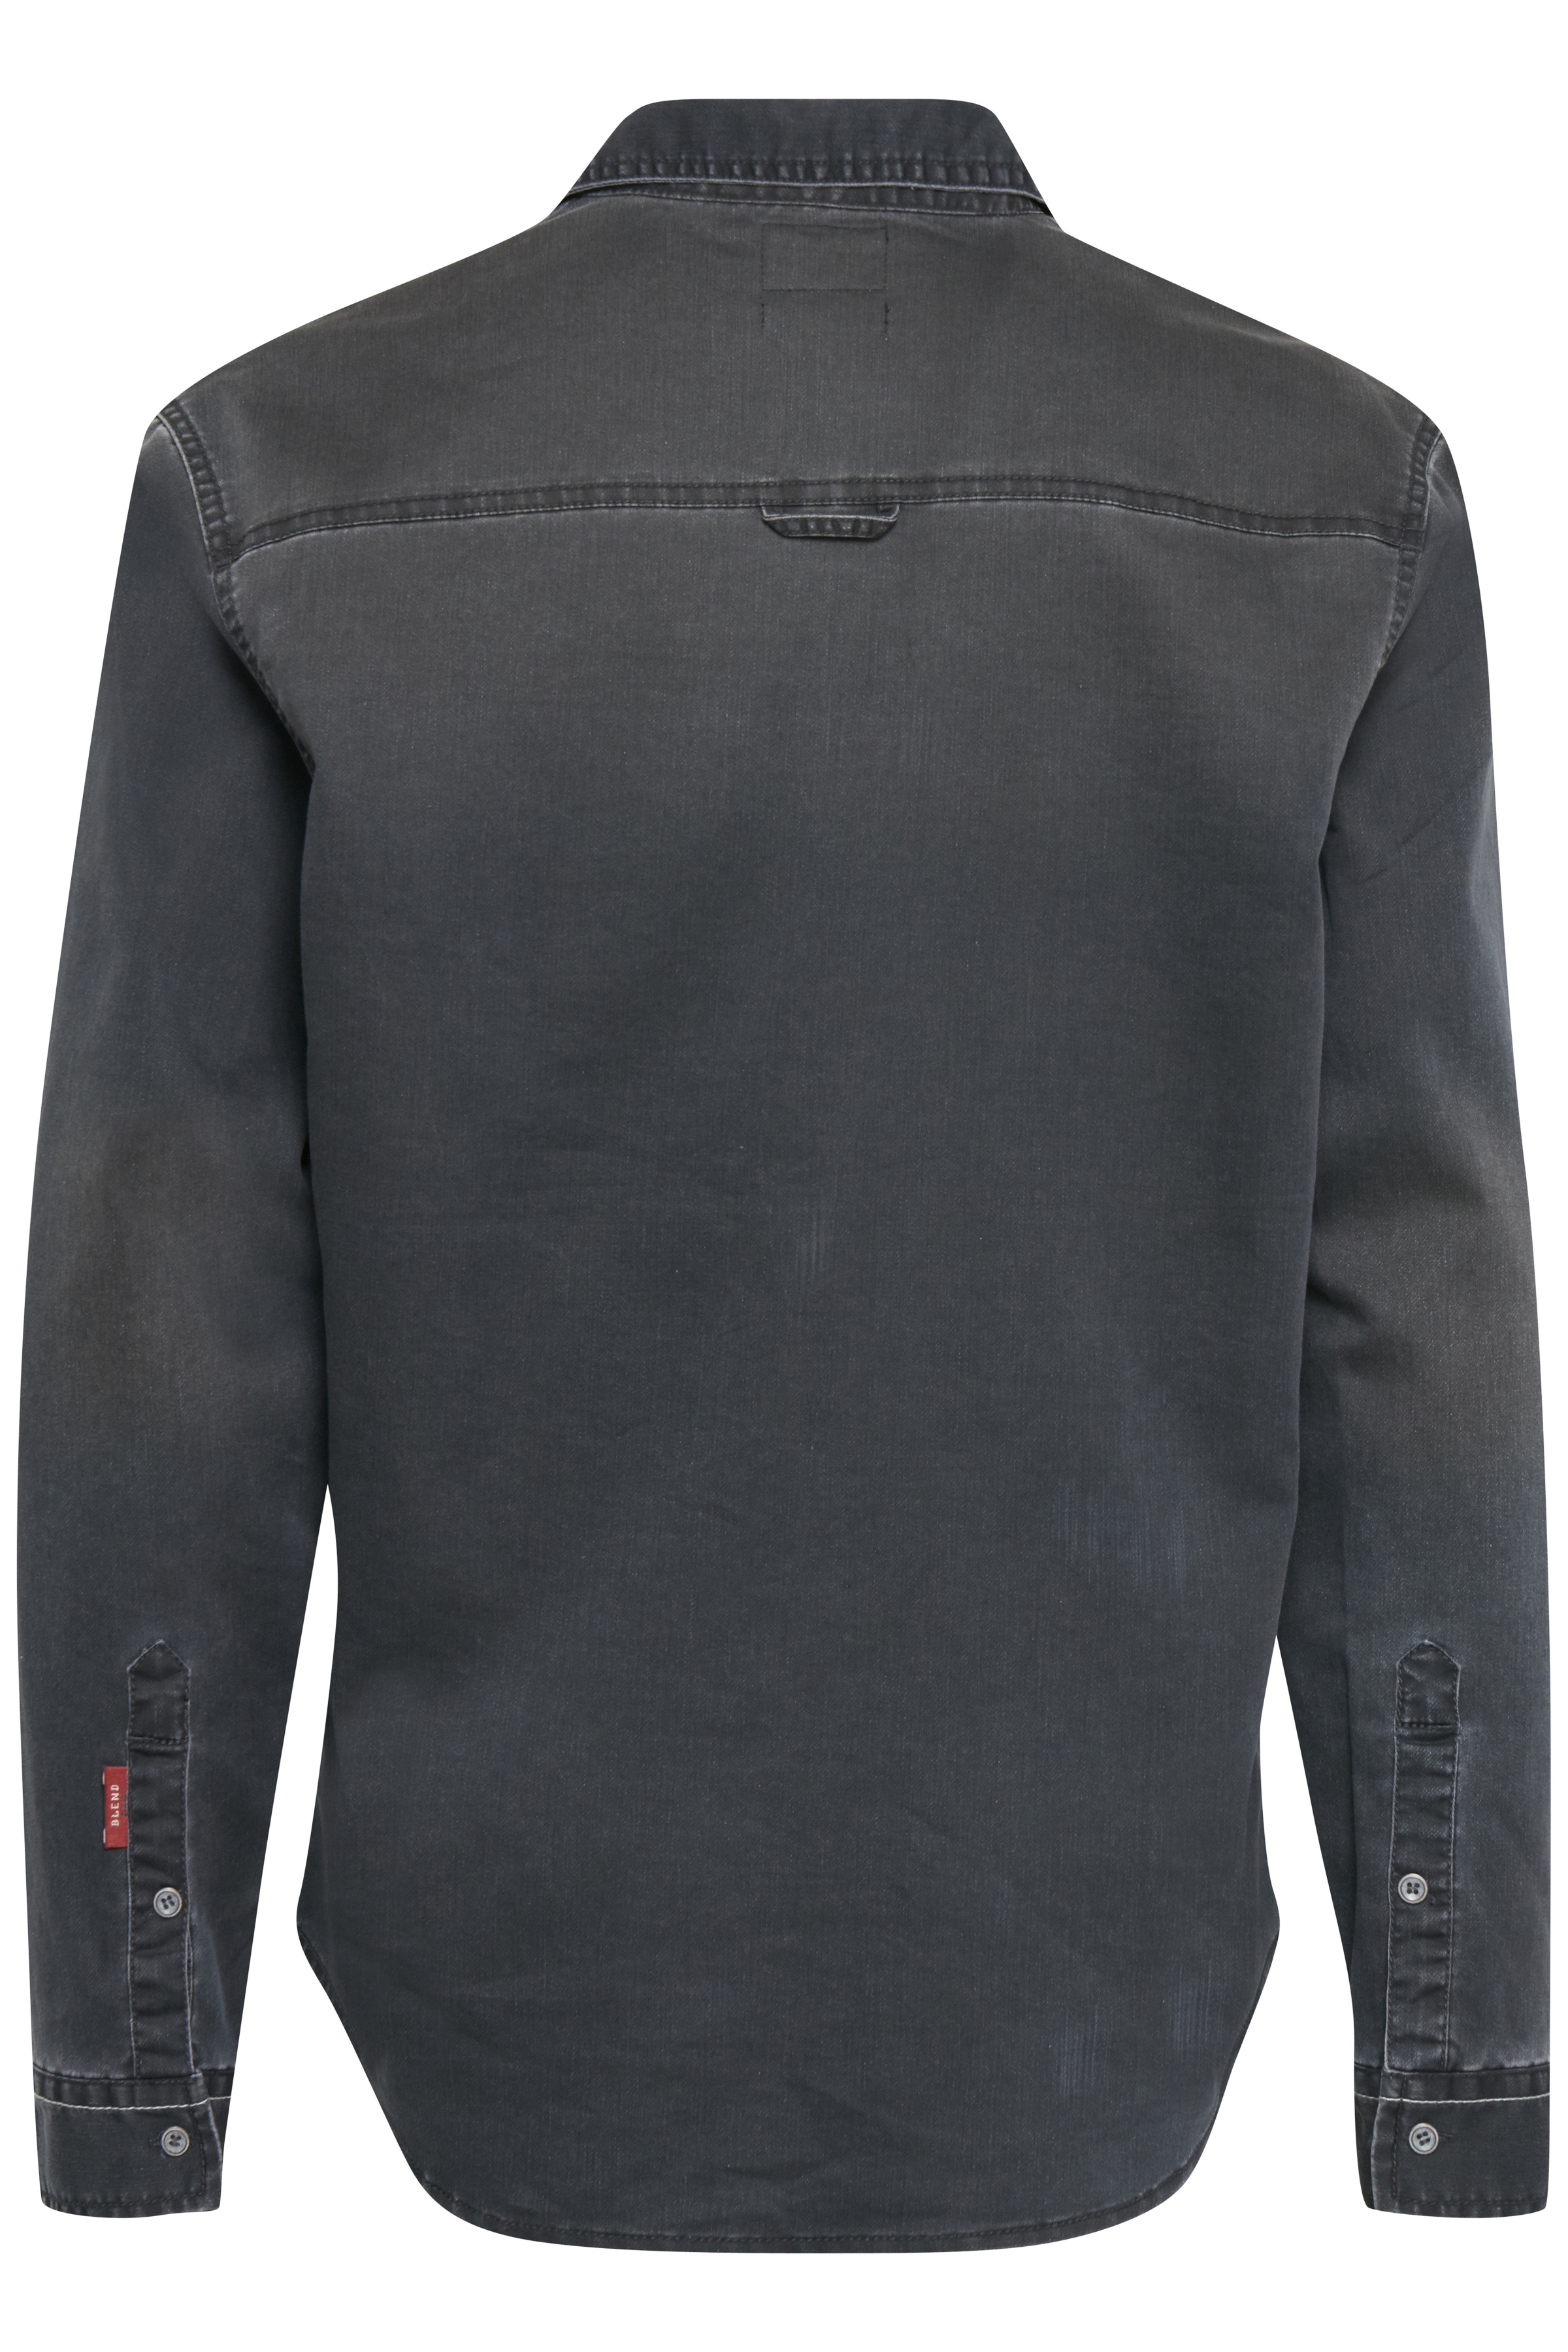 Granite Long sleeved shirt fra Blend He – Køb Granite Long sleeved shirt fra str. S-XL her